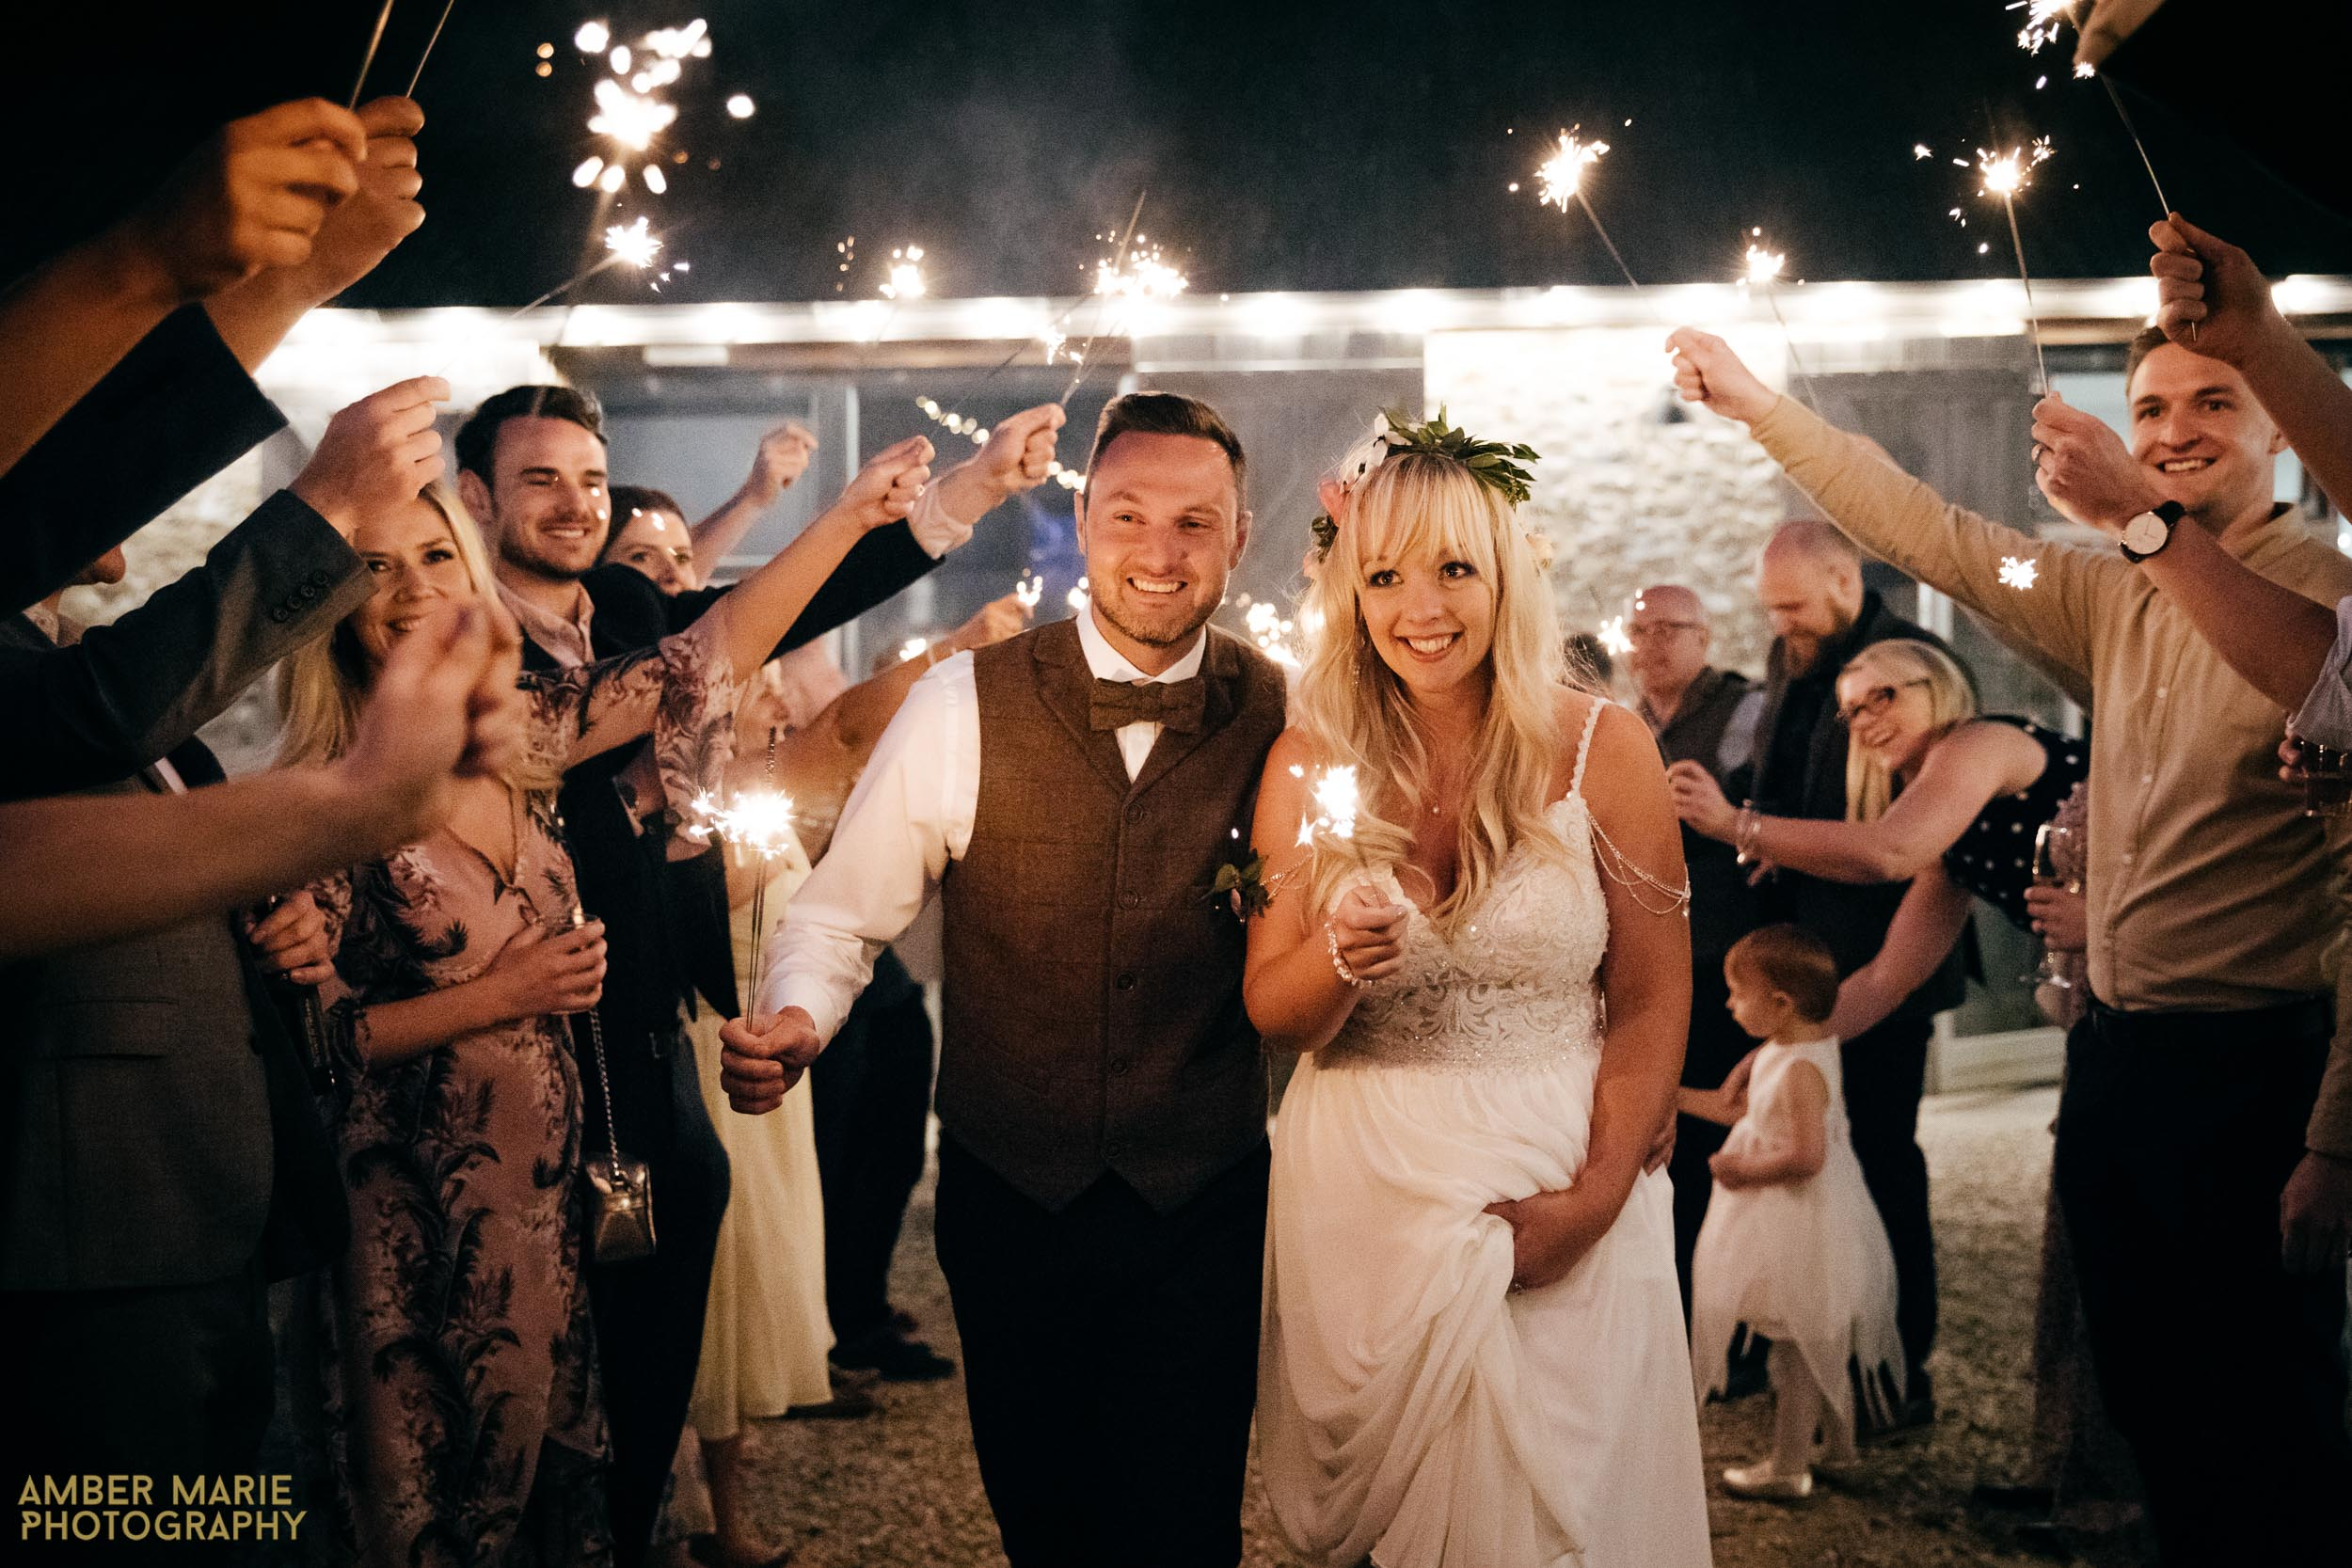 Wedding sparklers by creative wedding photographer